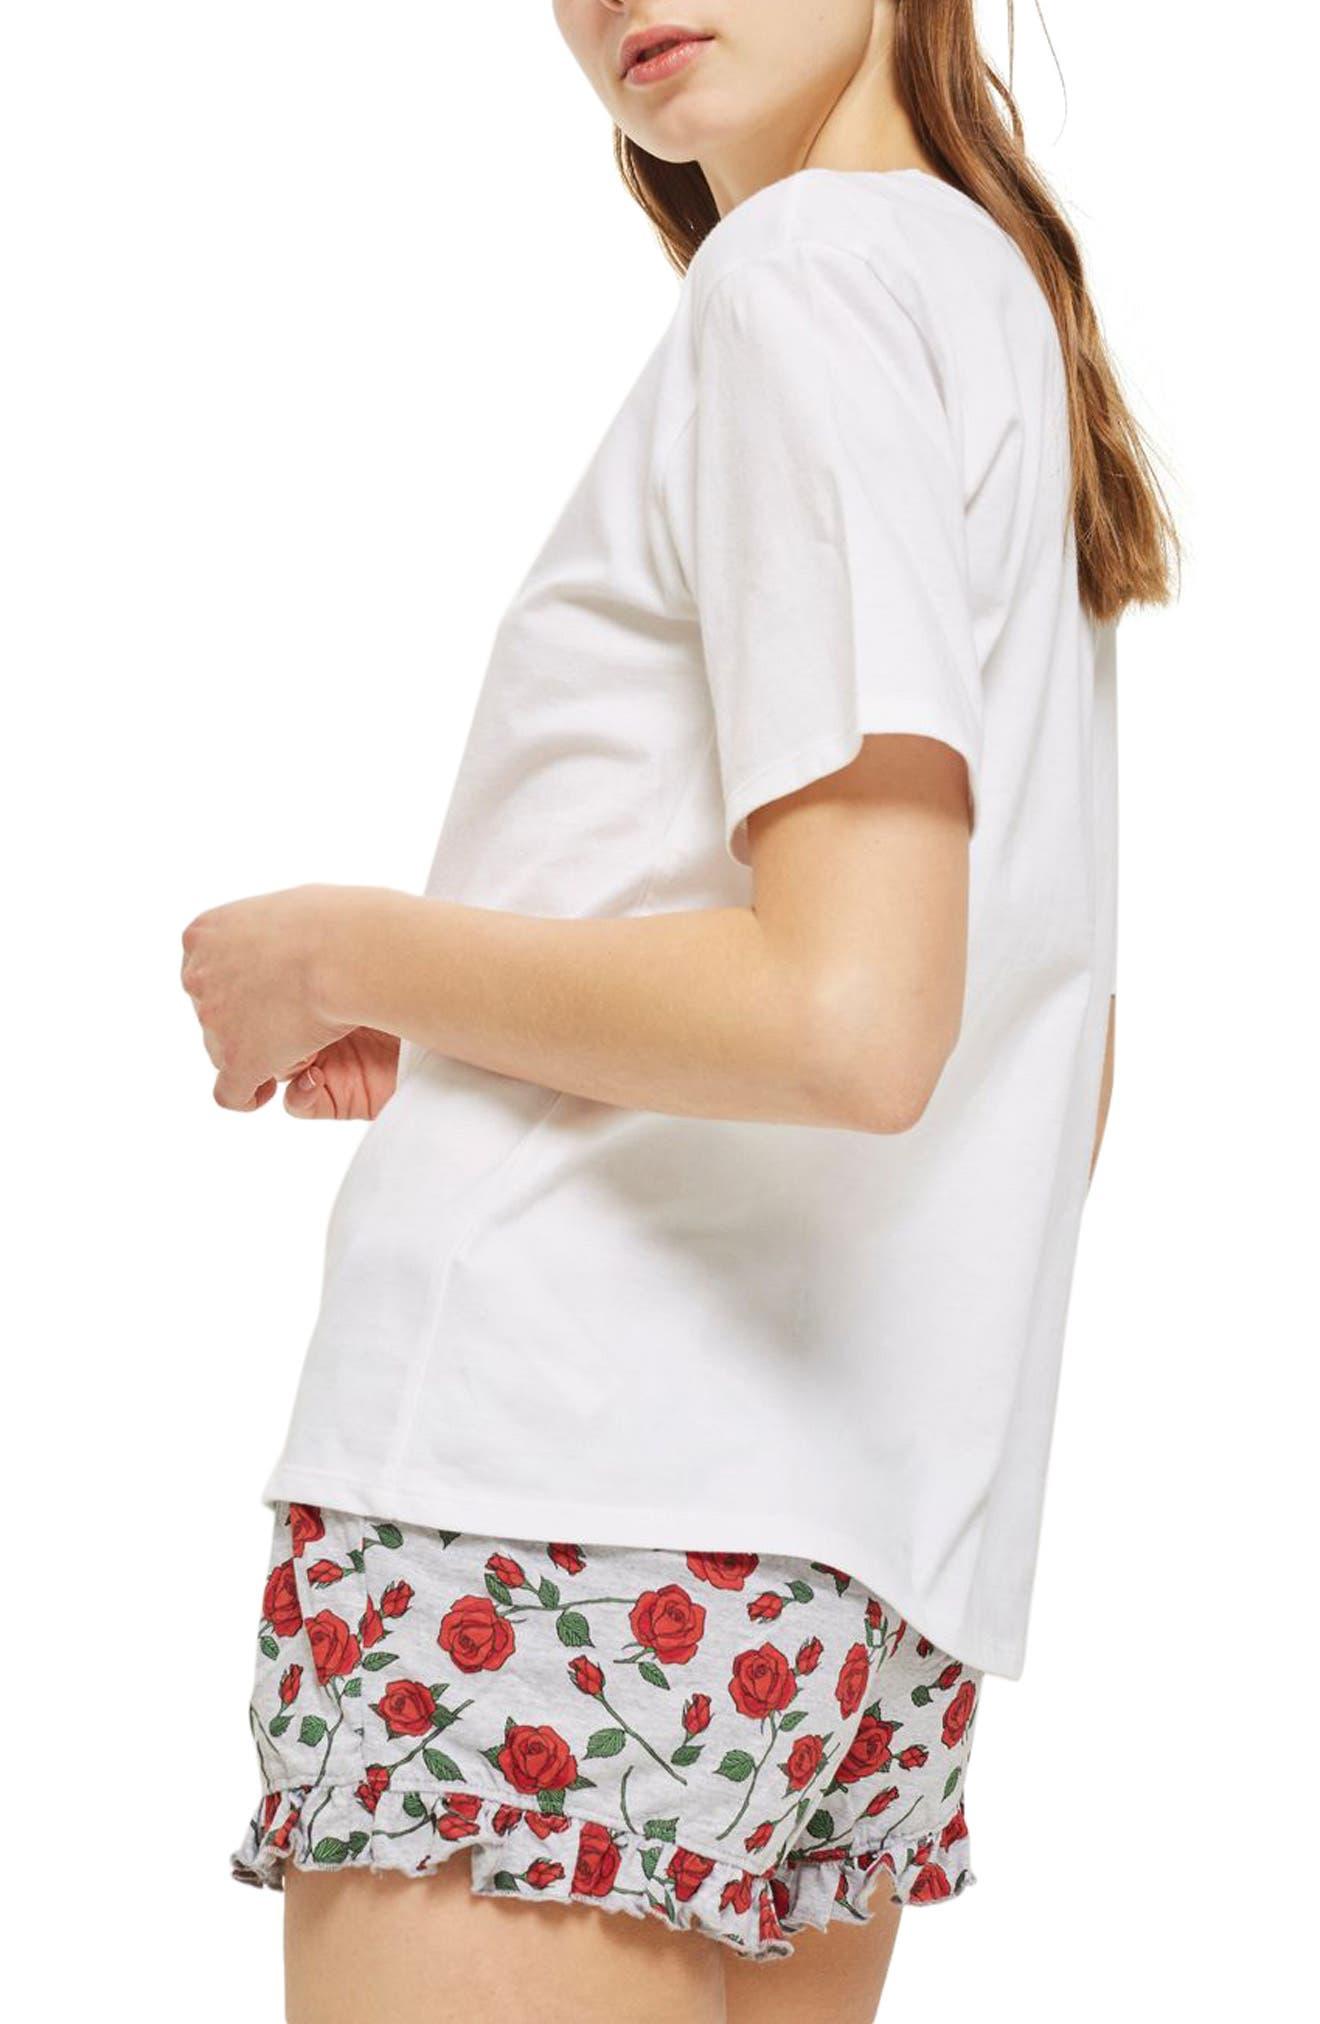 Disney<sup>®</sup> Belle Rose Short Pajamas,                             Alternate thumbnail 2, color,                             White Multi